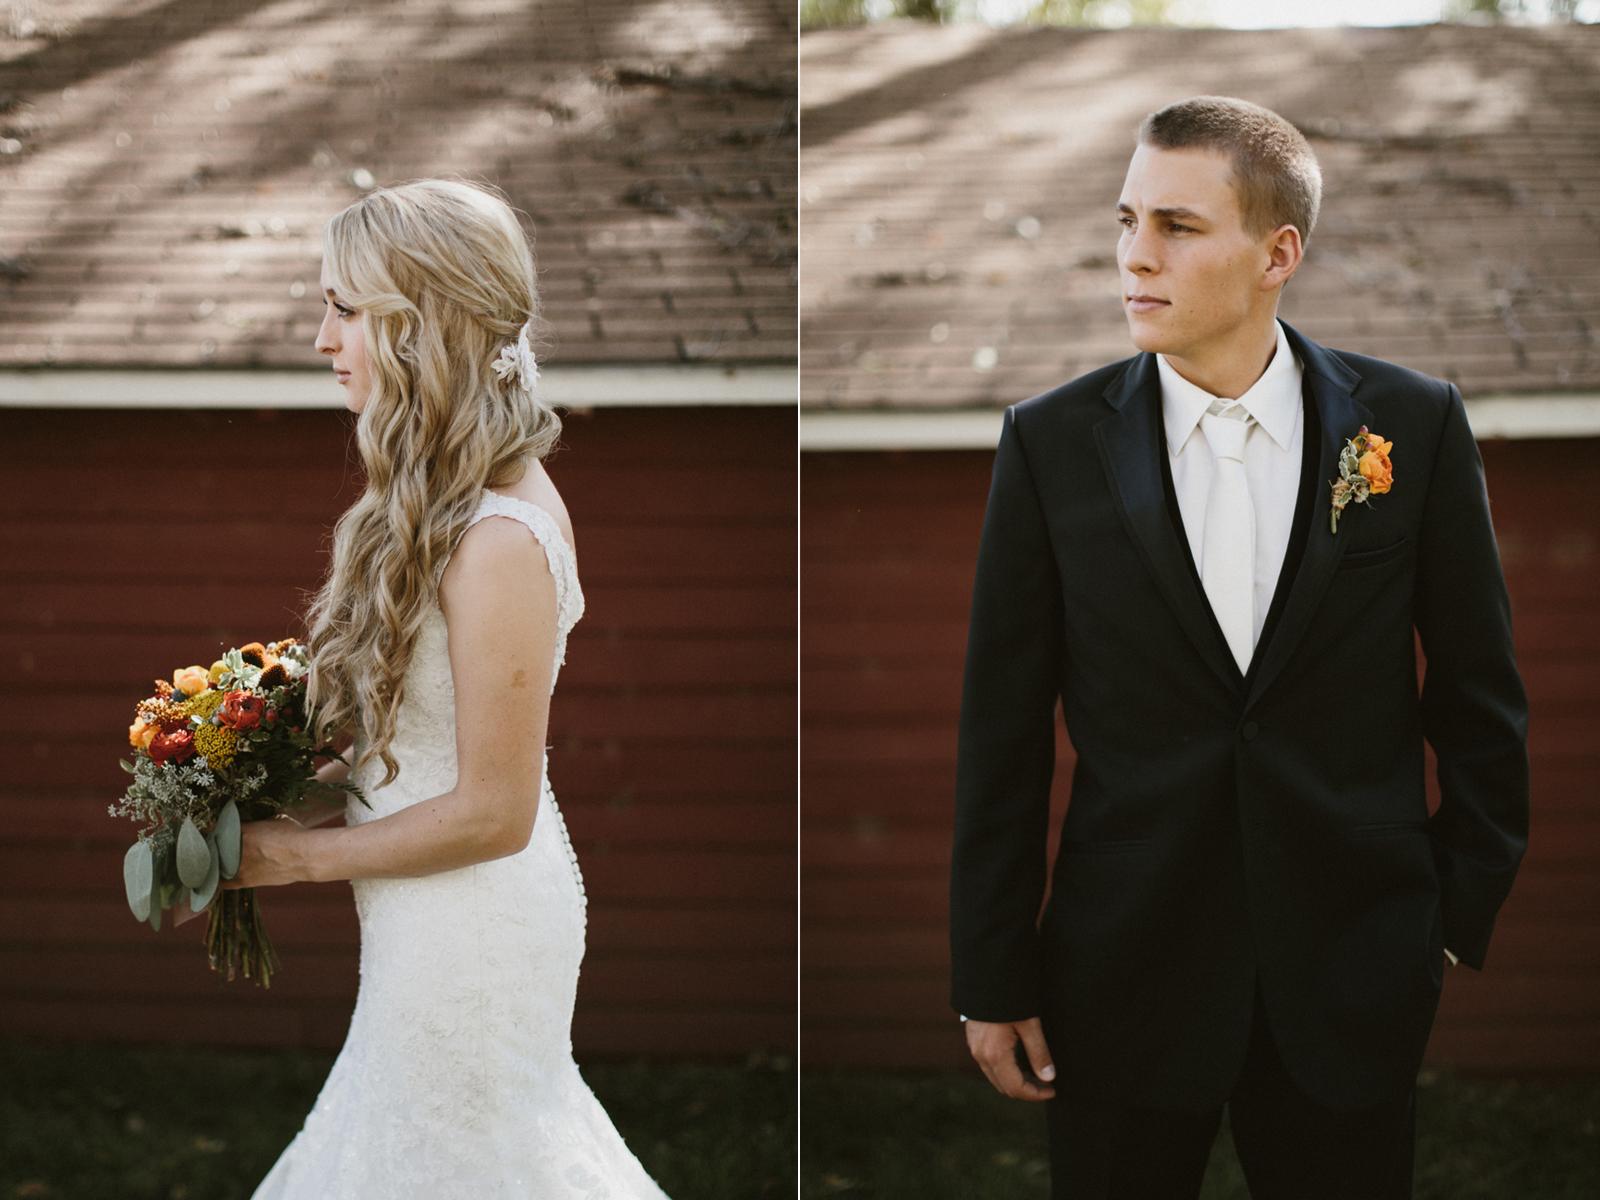 SiouxFalls_DesMoines_Wedding_Photographer_21.jpg